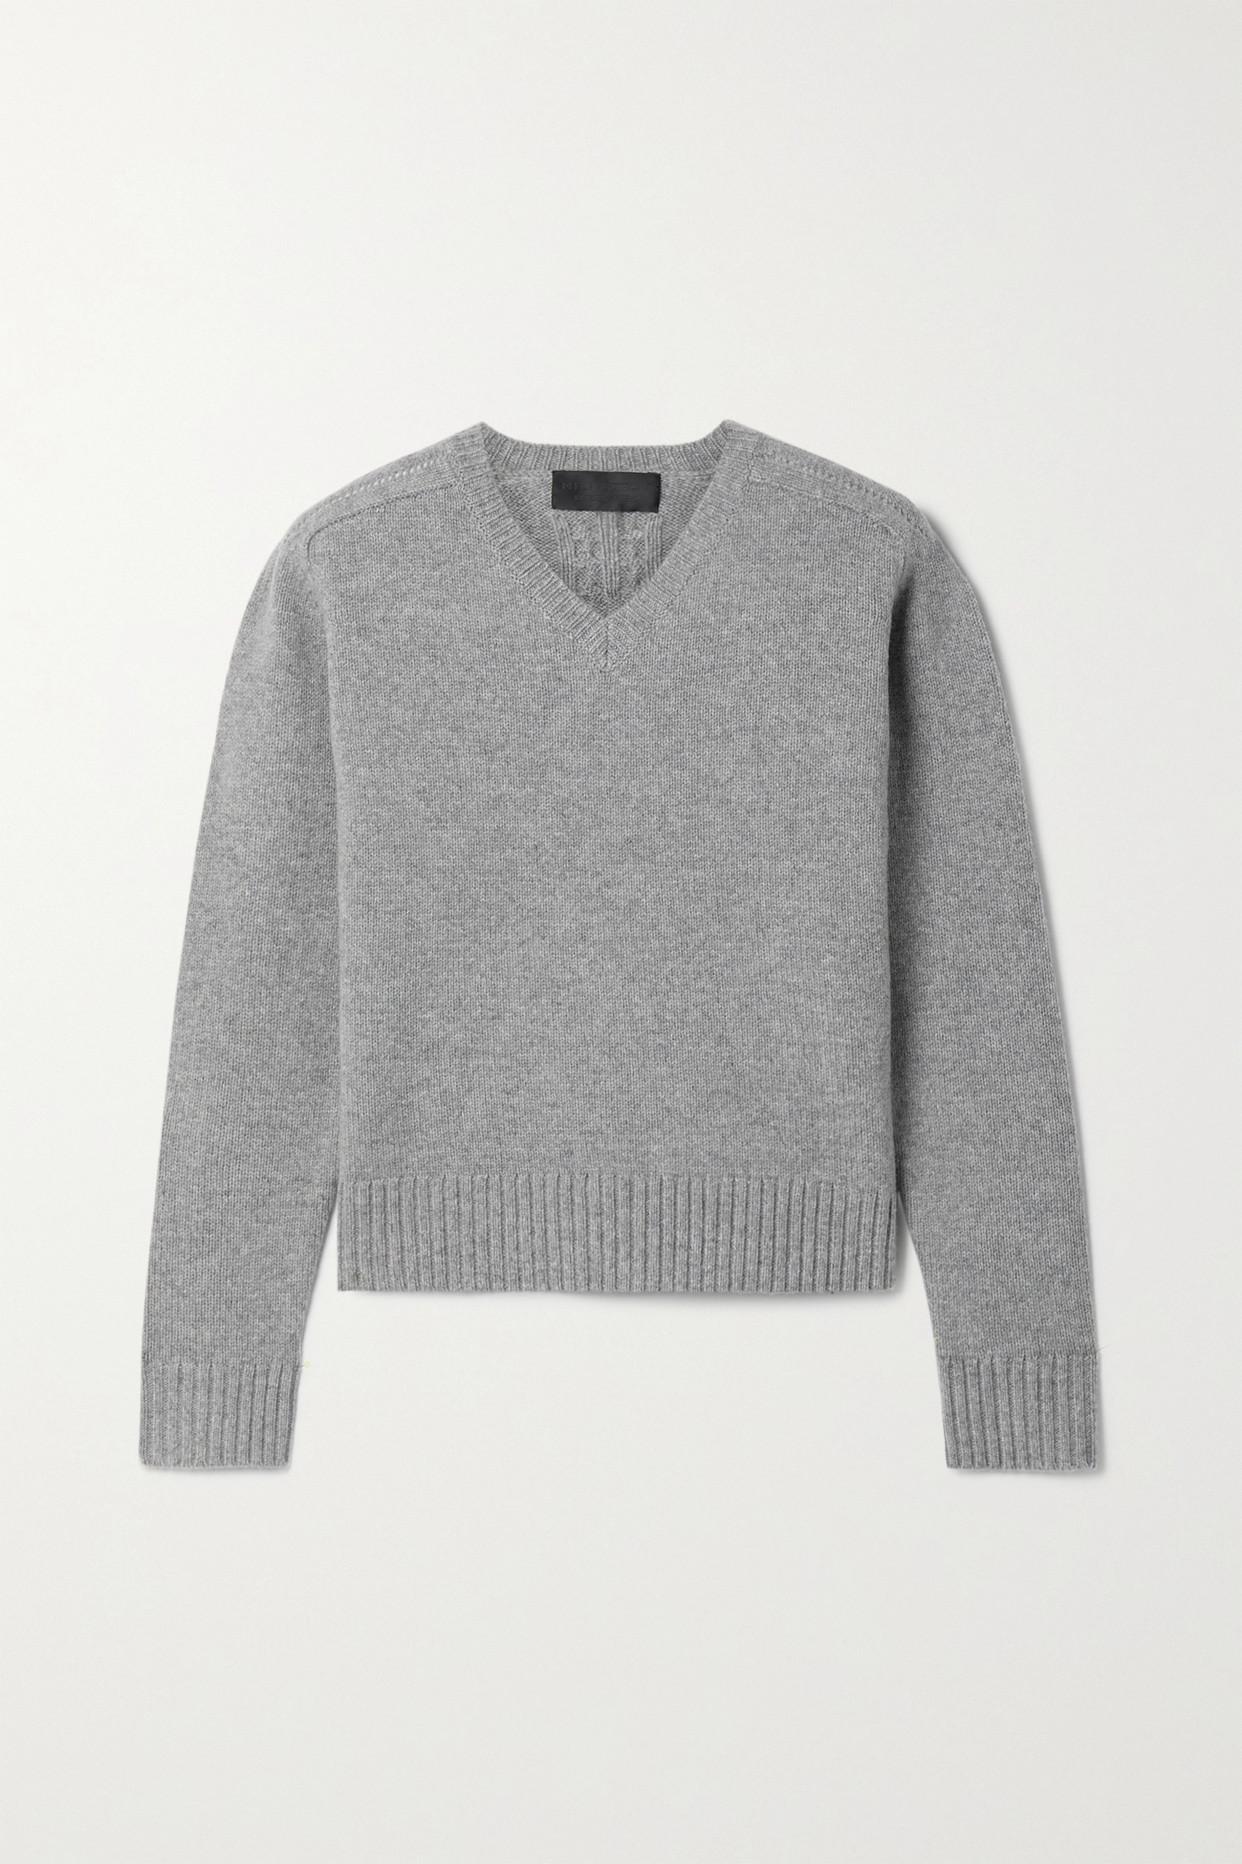 NILI LOTAN - Isadora 美利奴羊毛毛衣 - 灰色 - medium